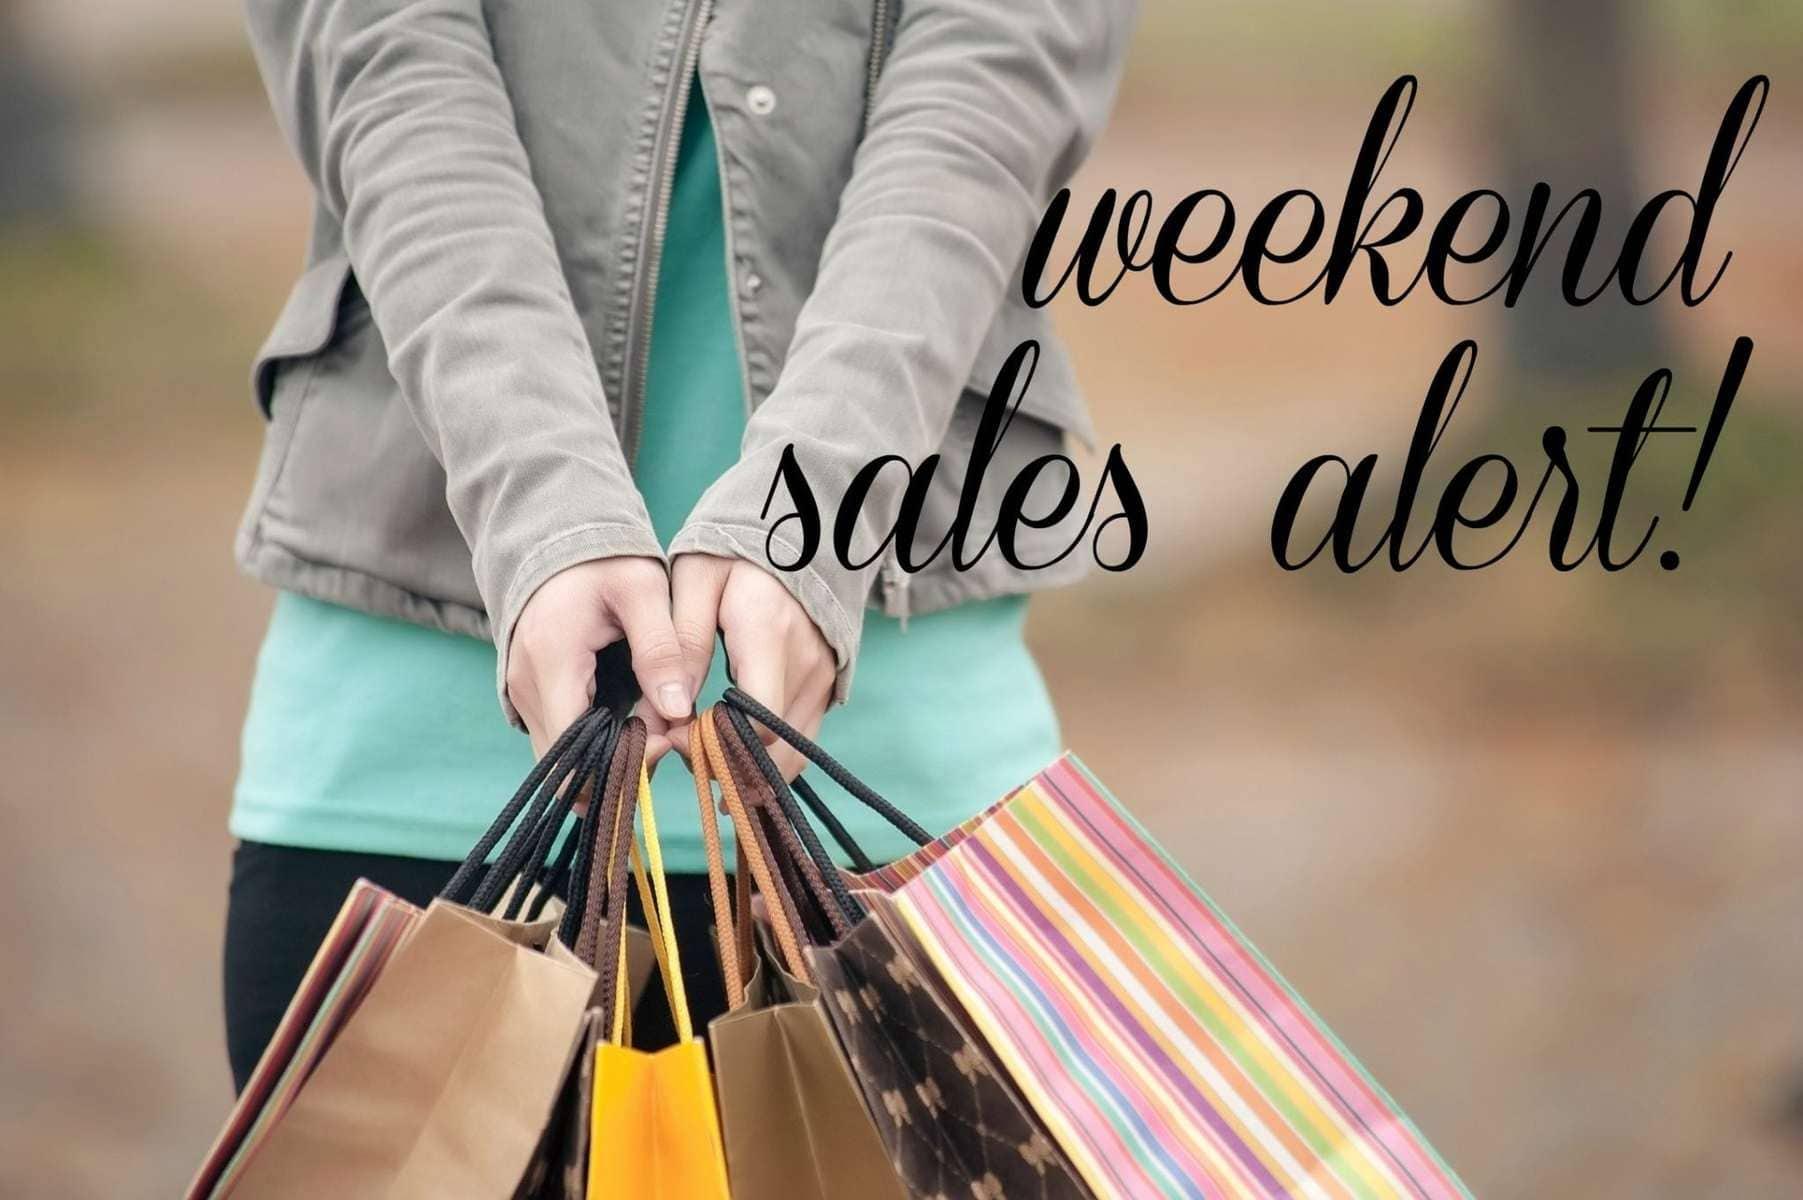 Weekend Sales Alert - Wardrobe Oxygen